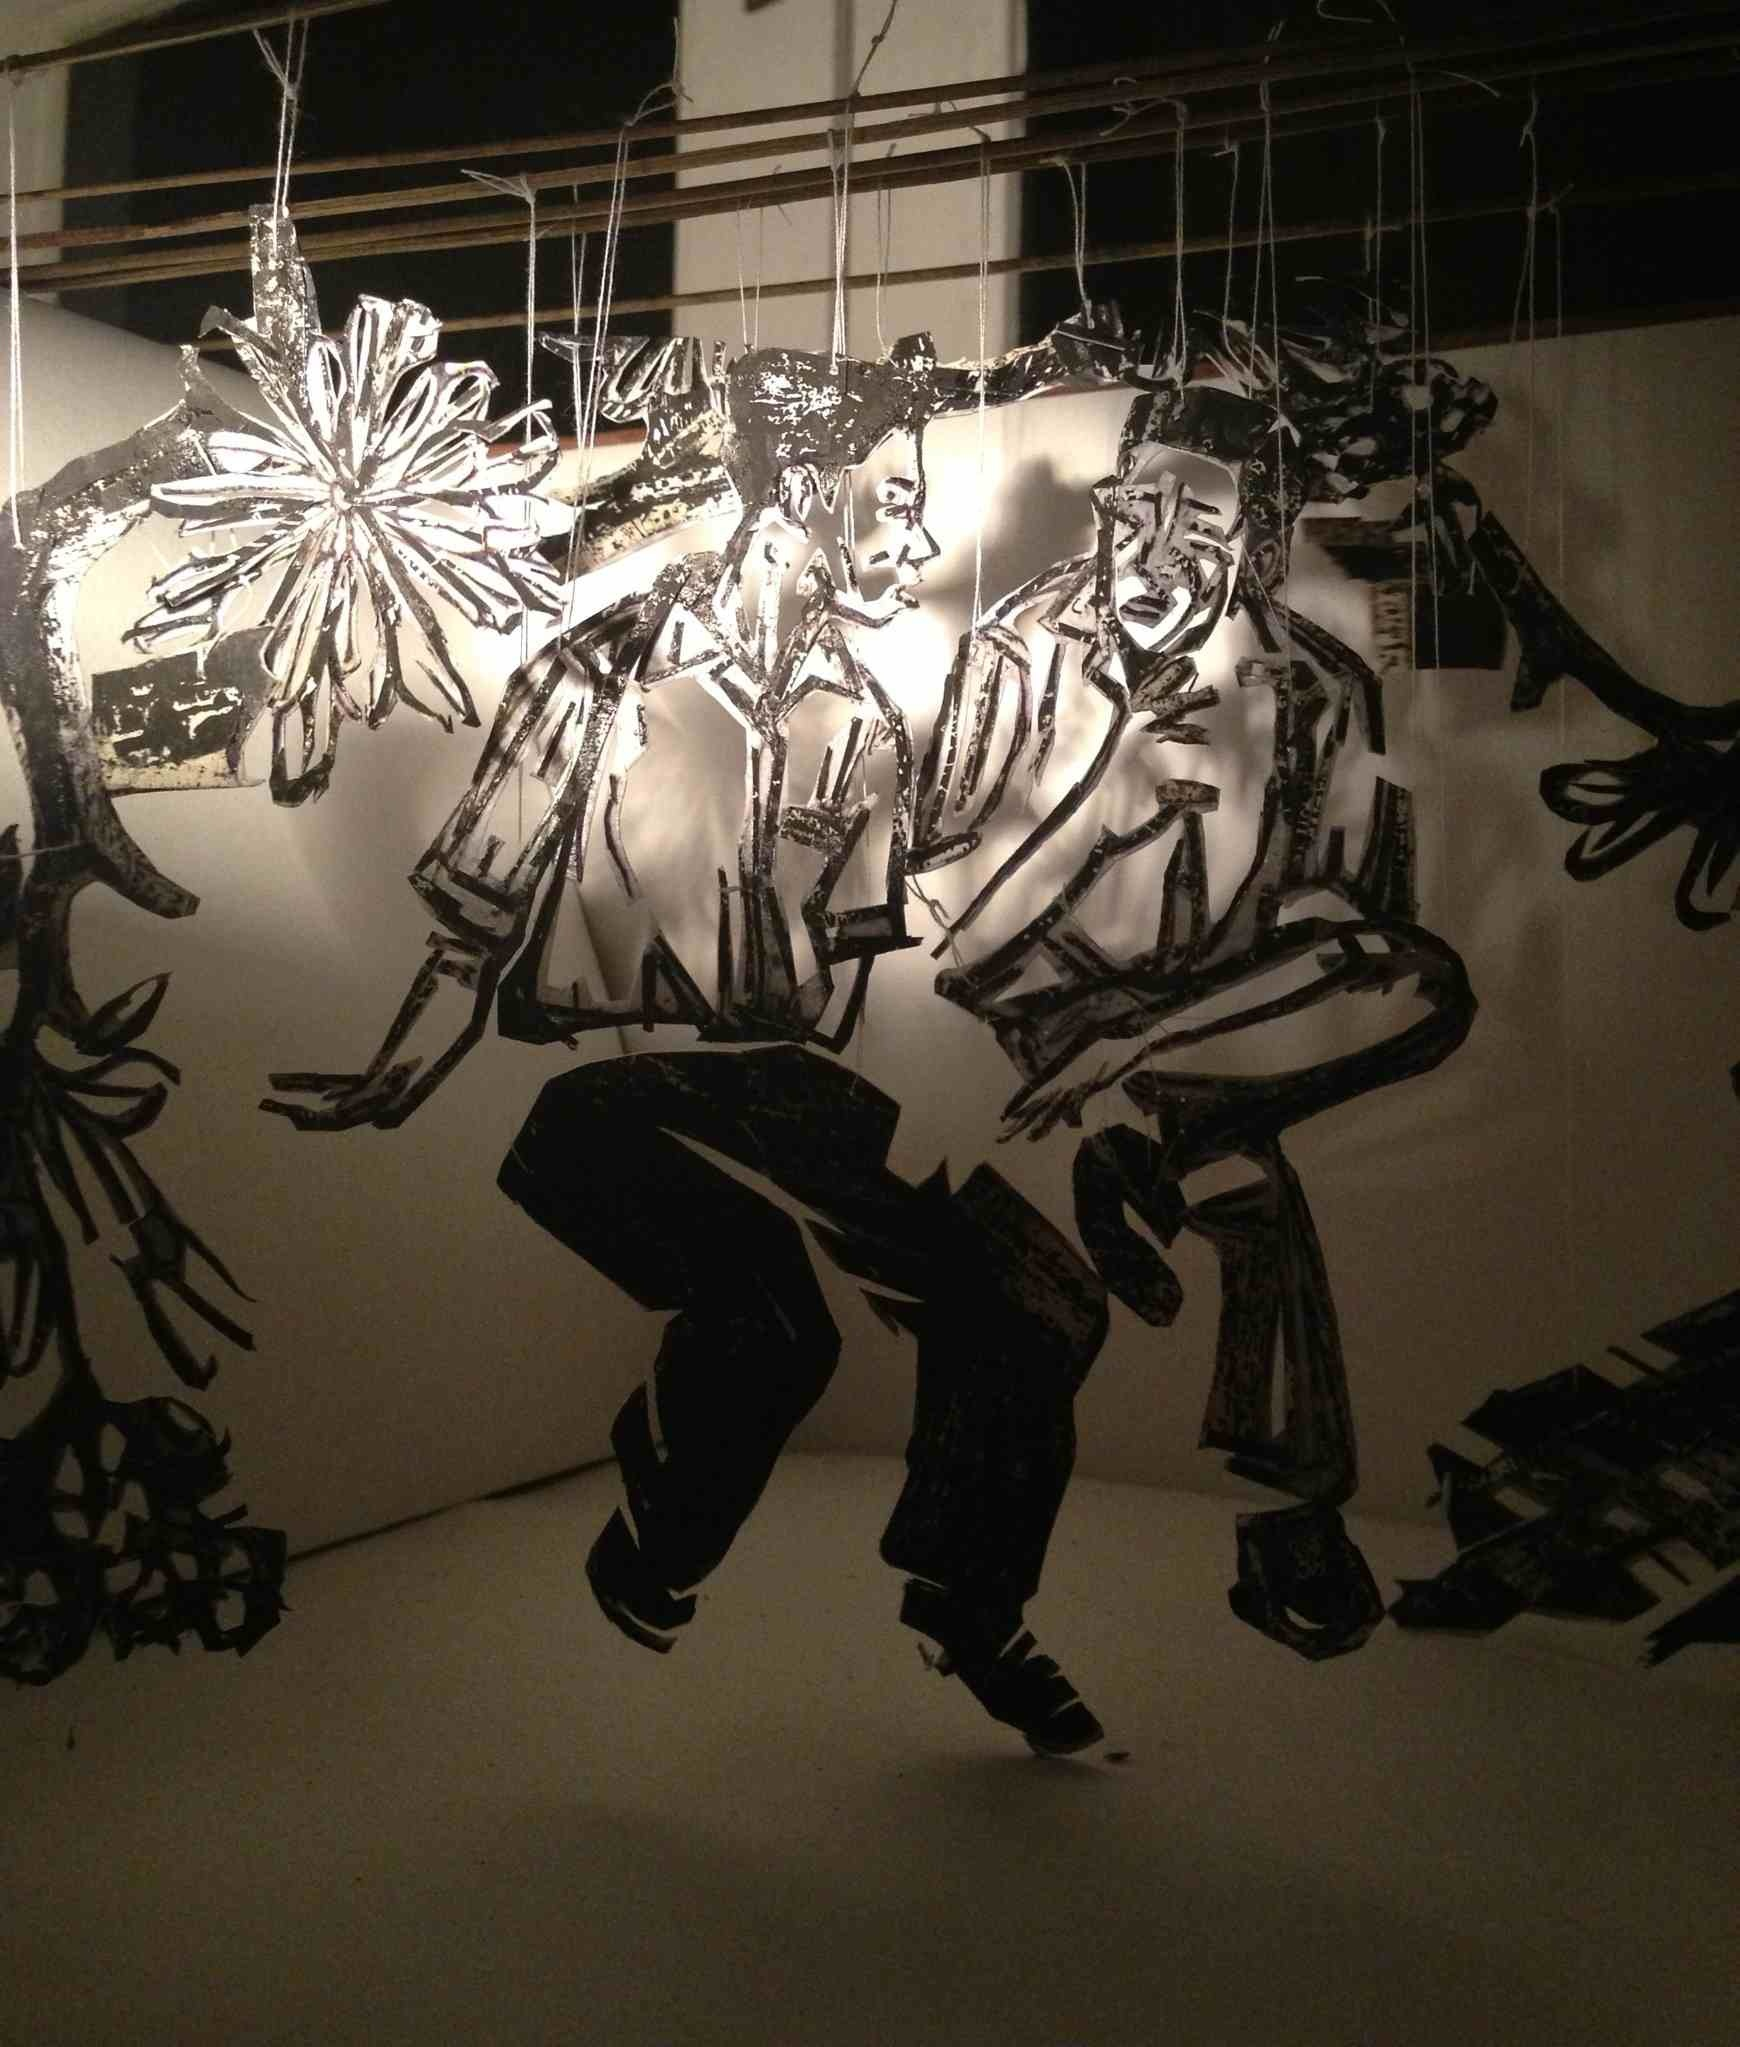 2013/10 Migrant Ecologies at FOST Gallery, Gillman Barracks